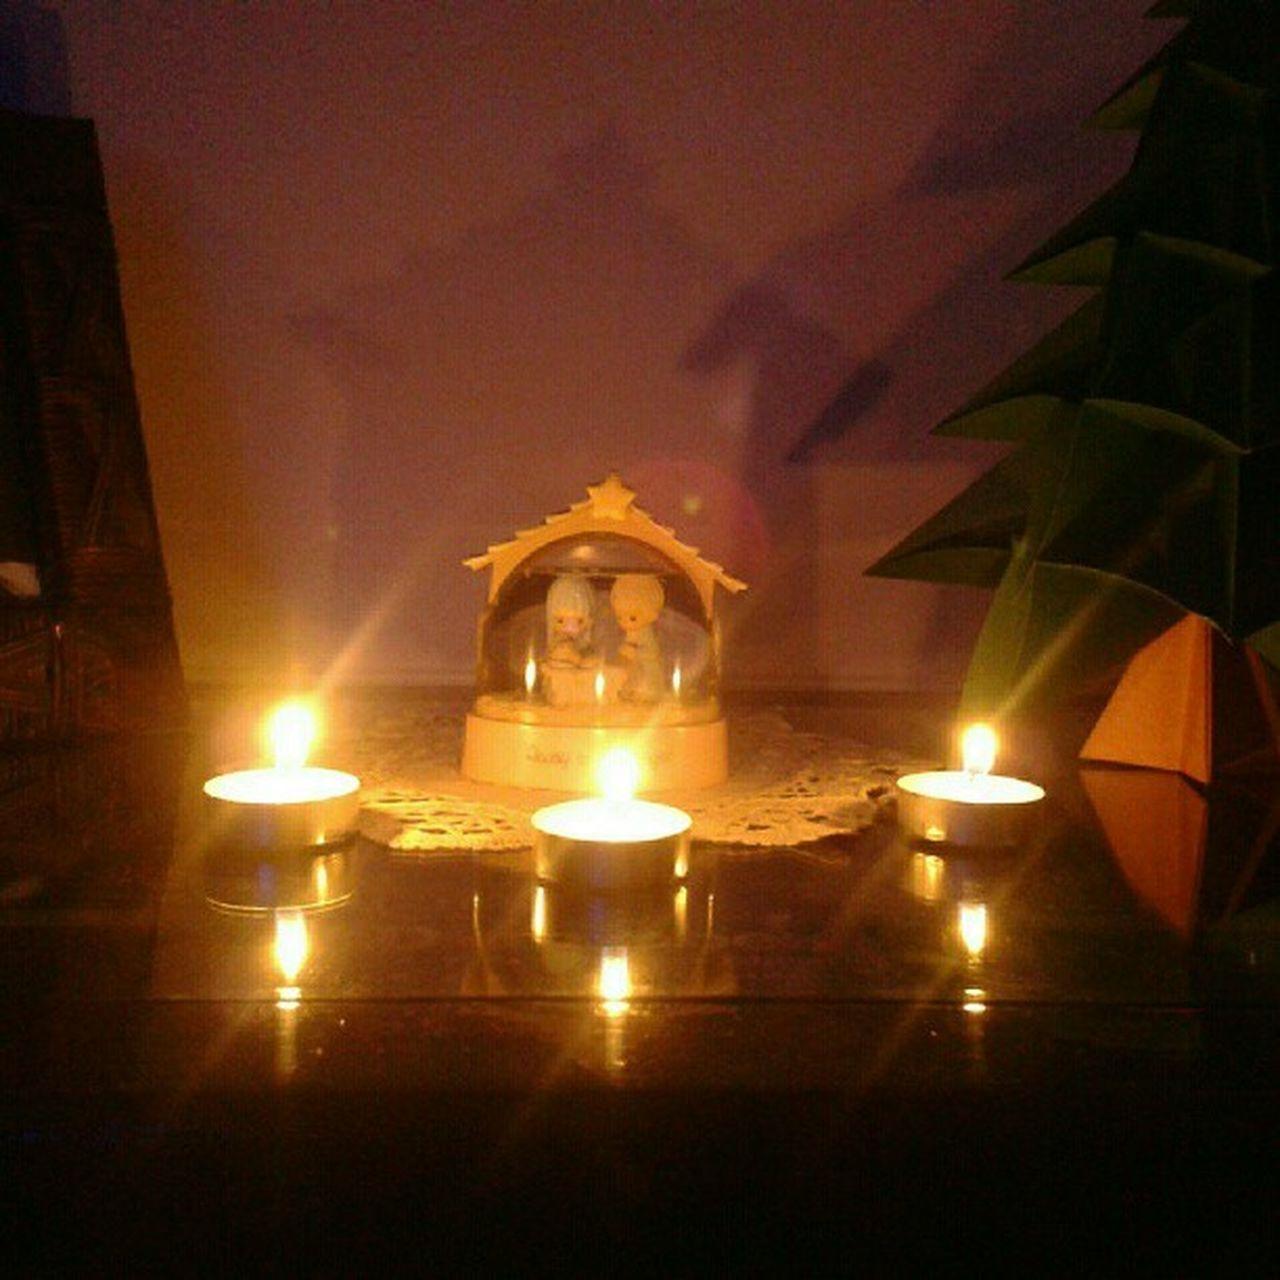 Estas son las velitas por mi hogar, mi familia y mis amigos. @Juanwot @1freddygiovanni @biwilhelm @oskar_gori @gulova @Copeoficial @cristilinda89 @maqpudeaza @pepegri29967322 @fernandobarco @pachok9 @paoladew @joparro @angieherrera123 @andfepe @lalitacg @instagram Nightofcandles Lights Christmas Yearnings